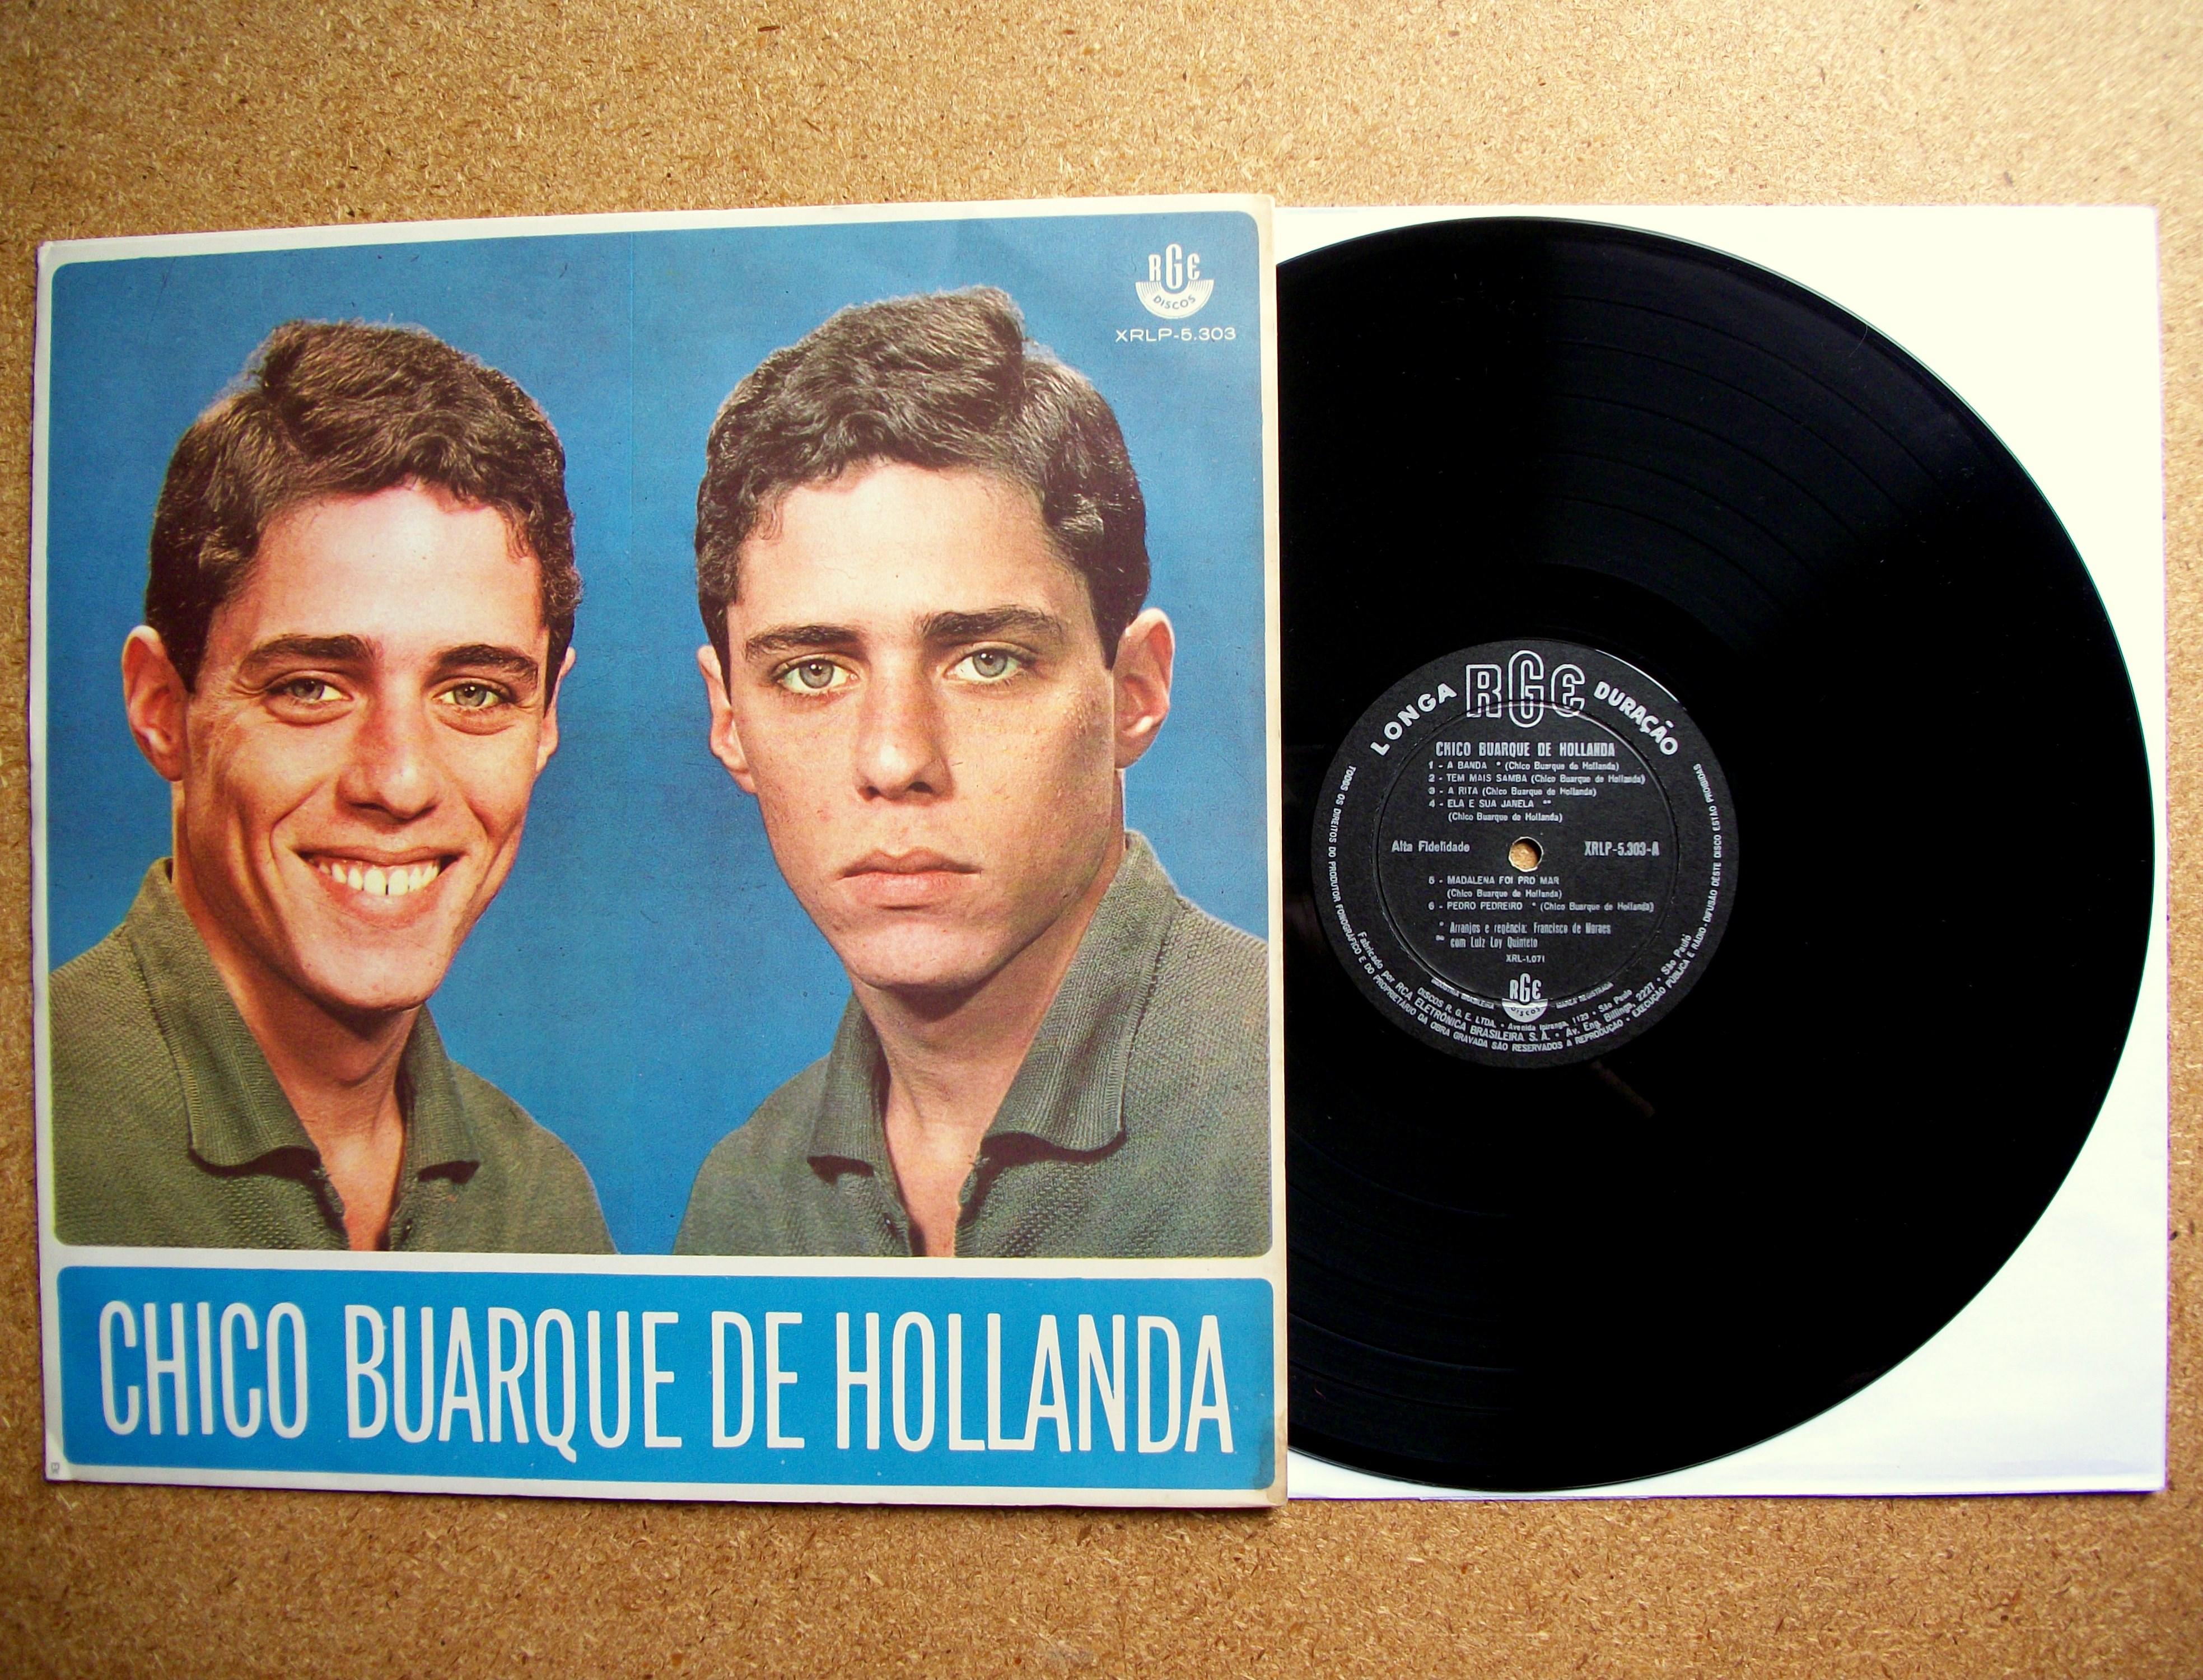 Chico Buarque De Hollanda Chico Buarque De Hollanda Volume 3